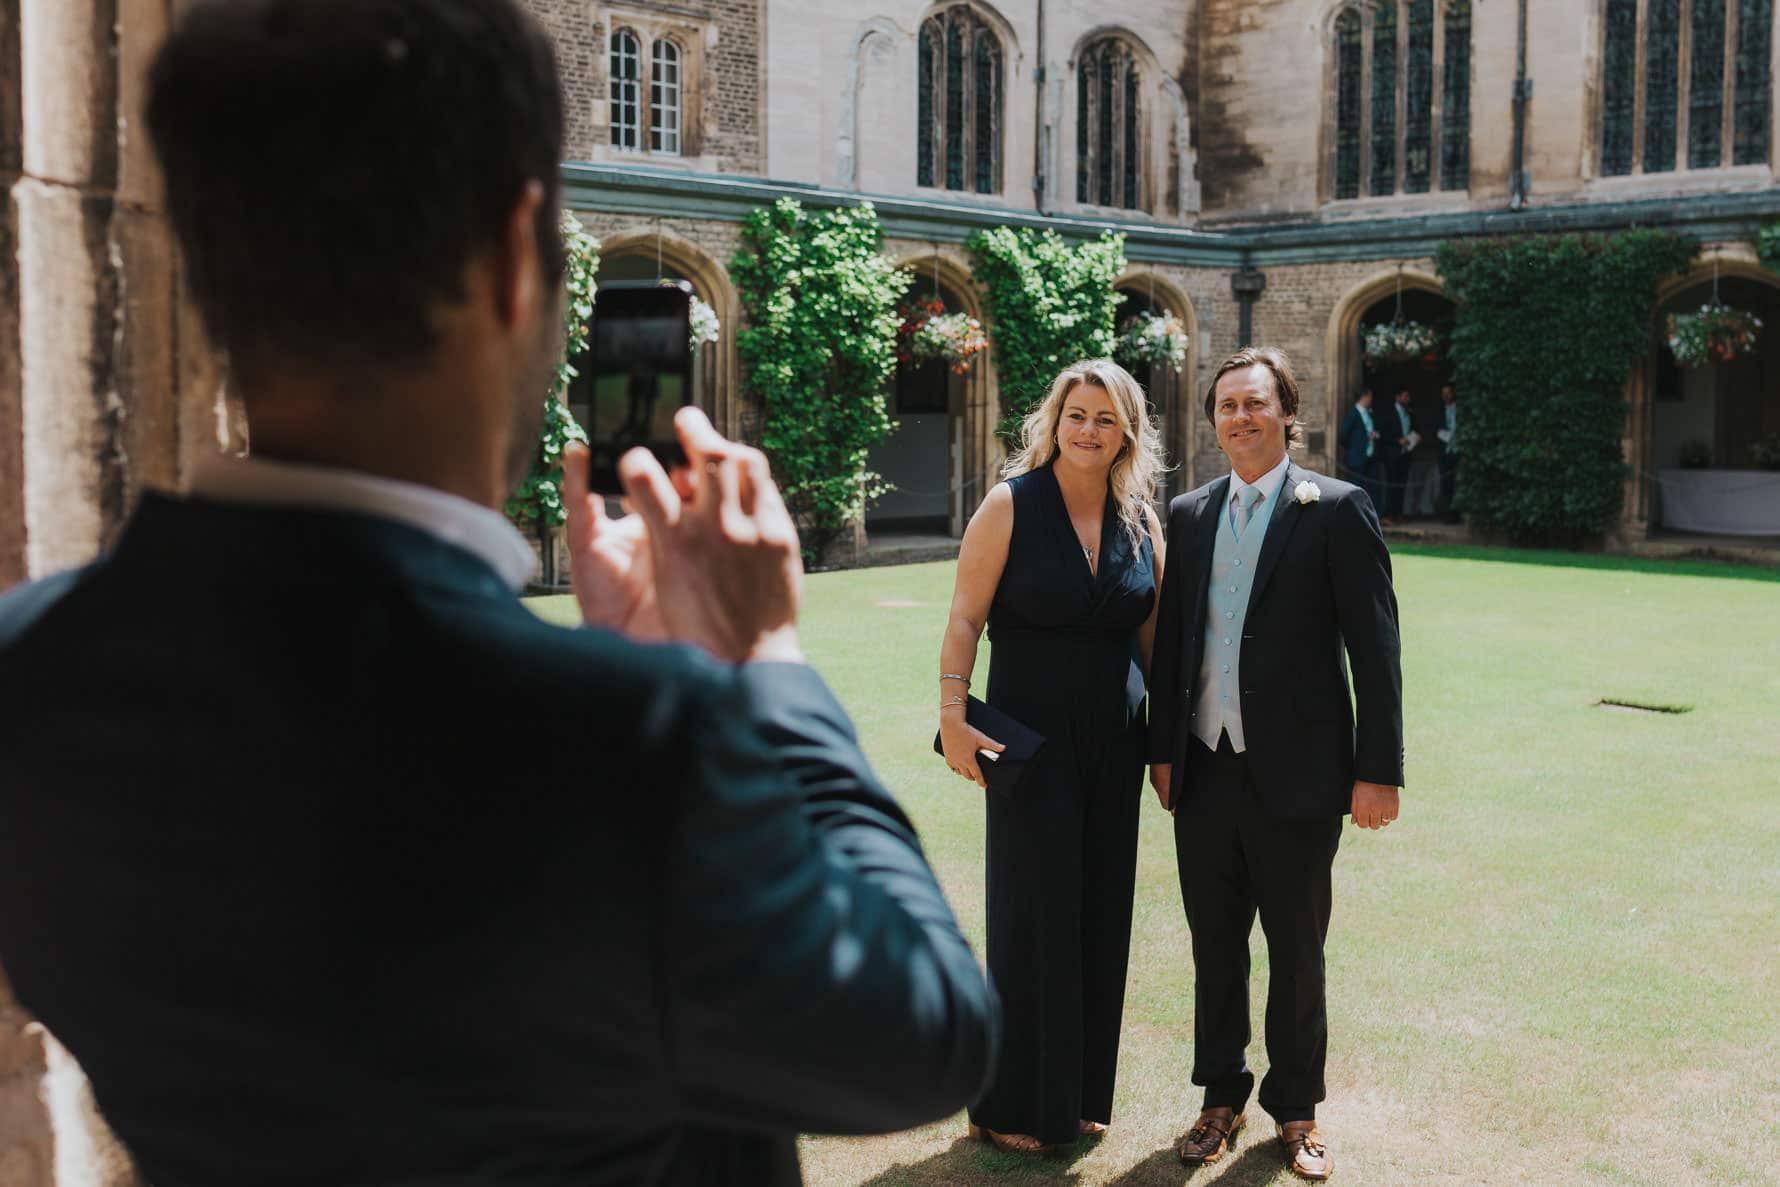 Wedding guests standing on a garden having their photo taken±